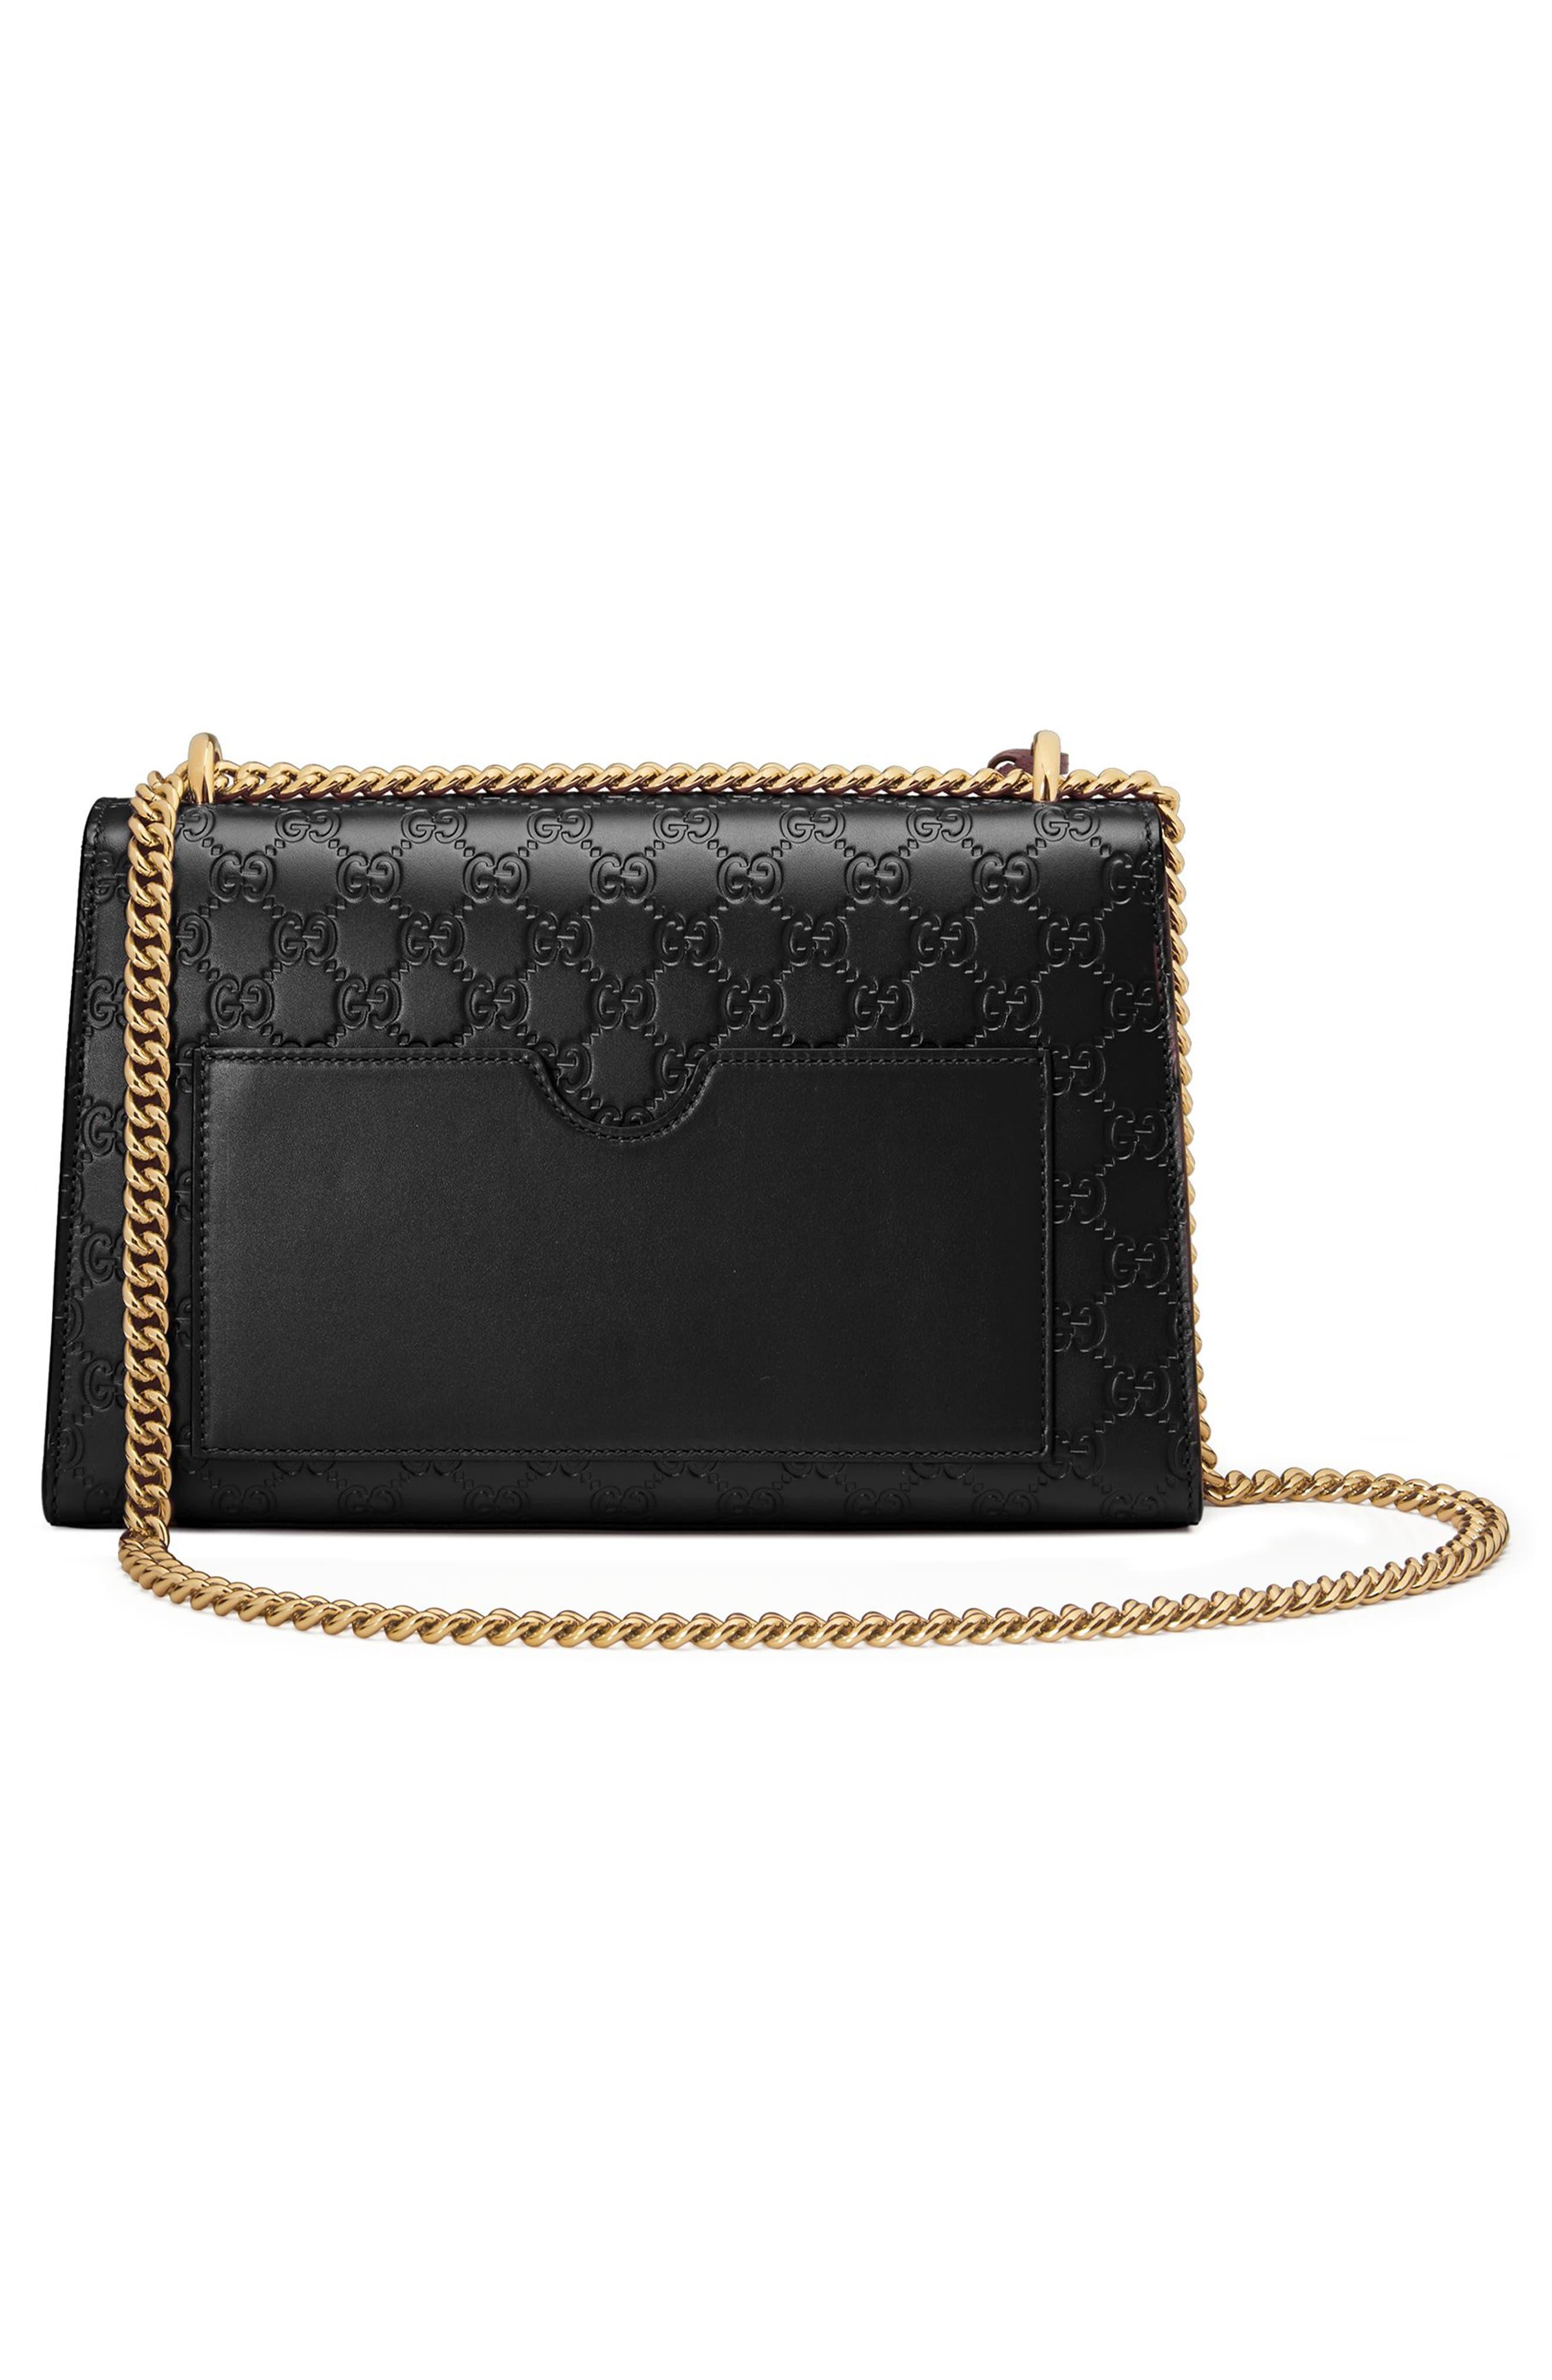 d43f8d8904 Push Lock Handbags   Wallets for Women